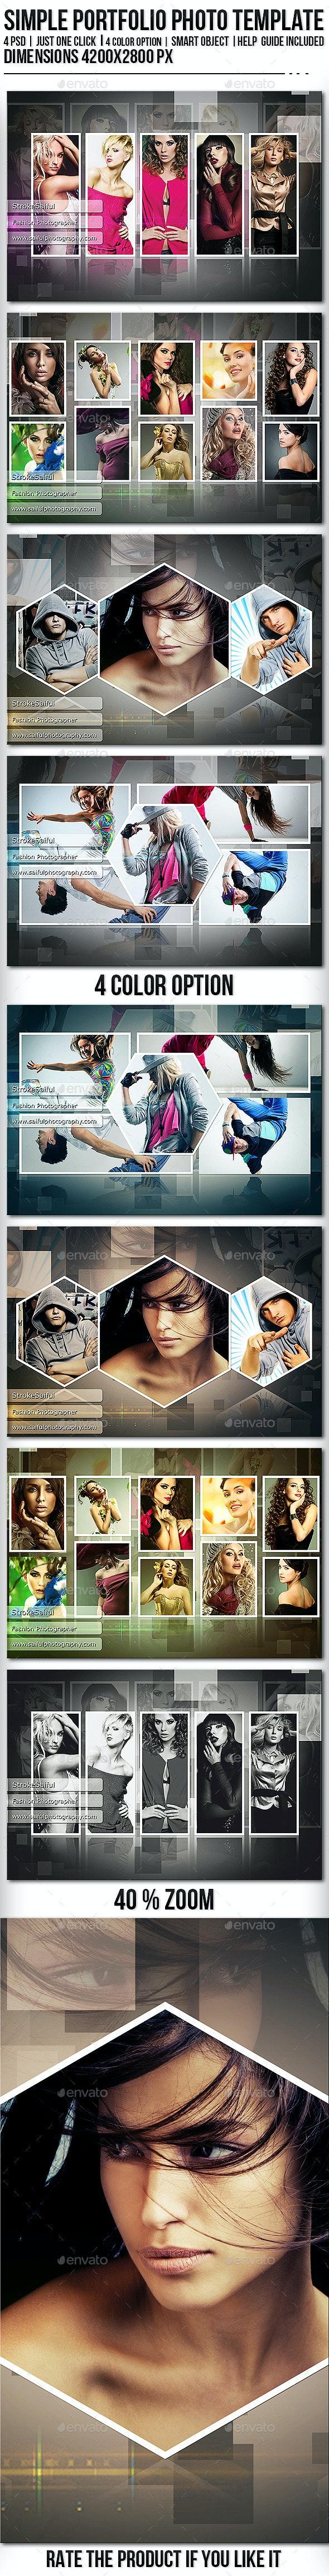 Simple Portfolio Photo Template - Photo Templates Graphics